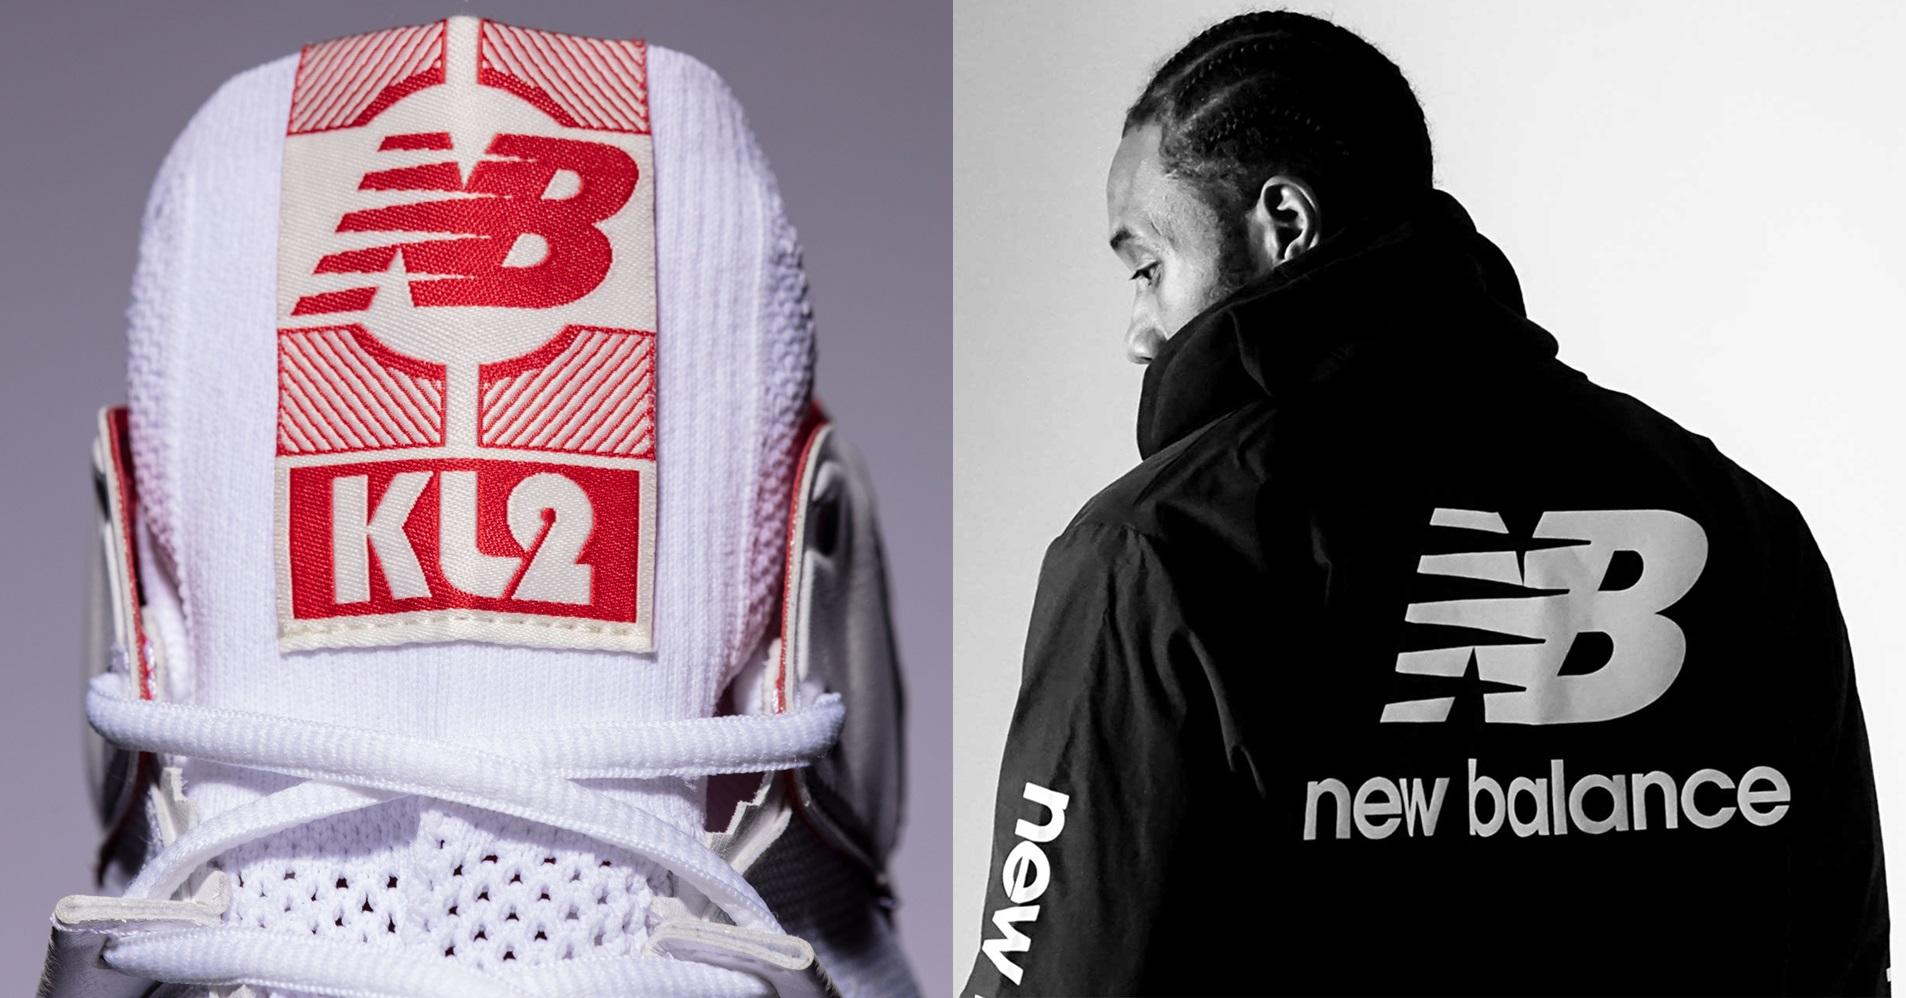 b03b1f2aef0 Kawhi Leonard debuts his signature New Balance shoe